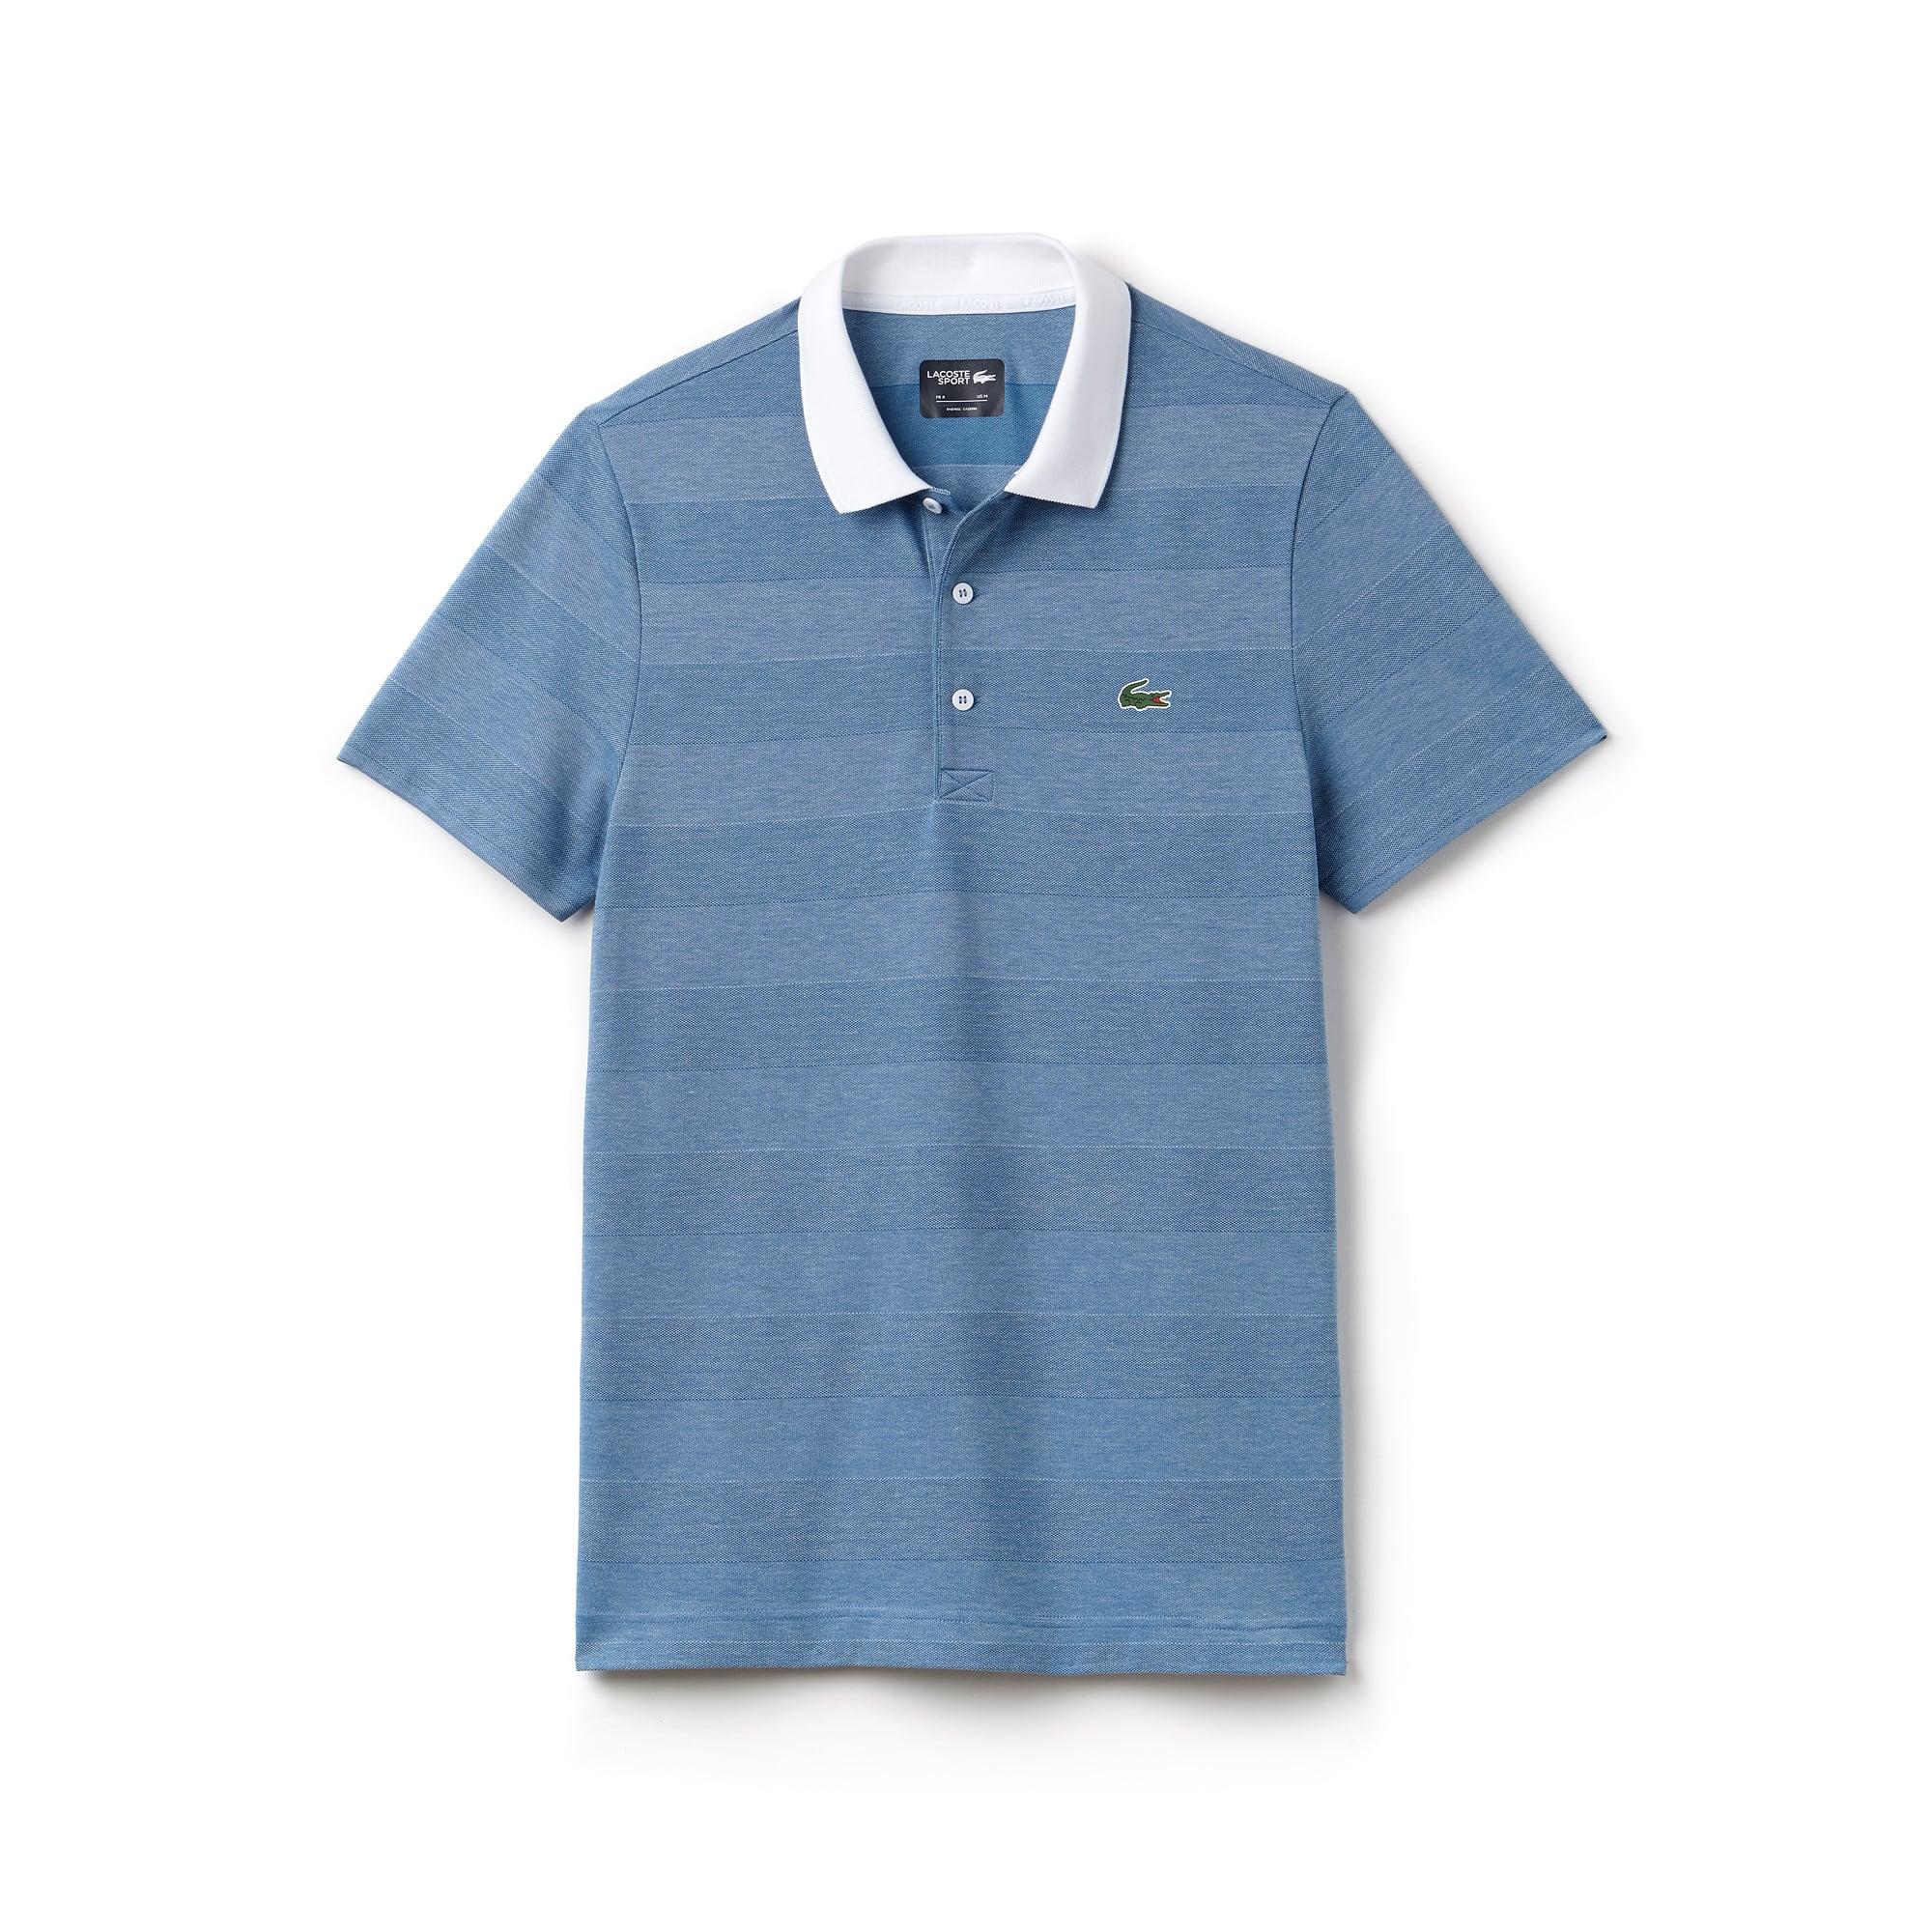 Men's SPORT Technical Jersey Golf Polo